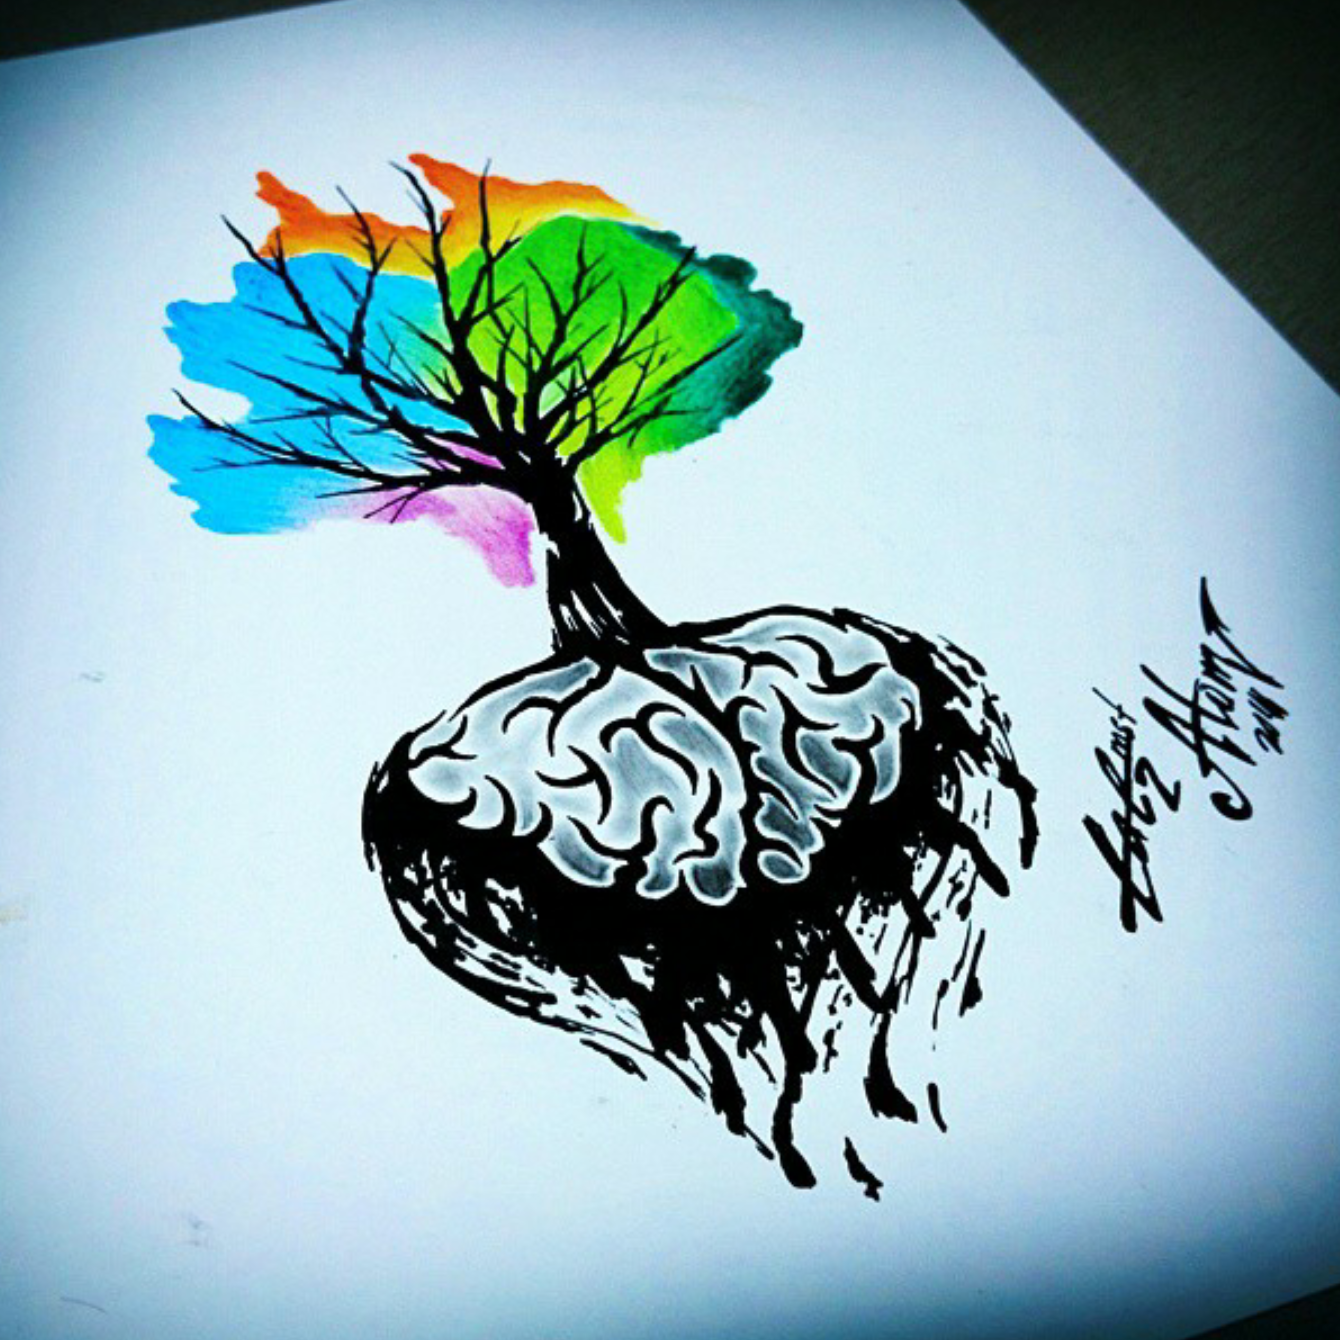 тату эскиз мозг и дерево